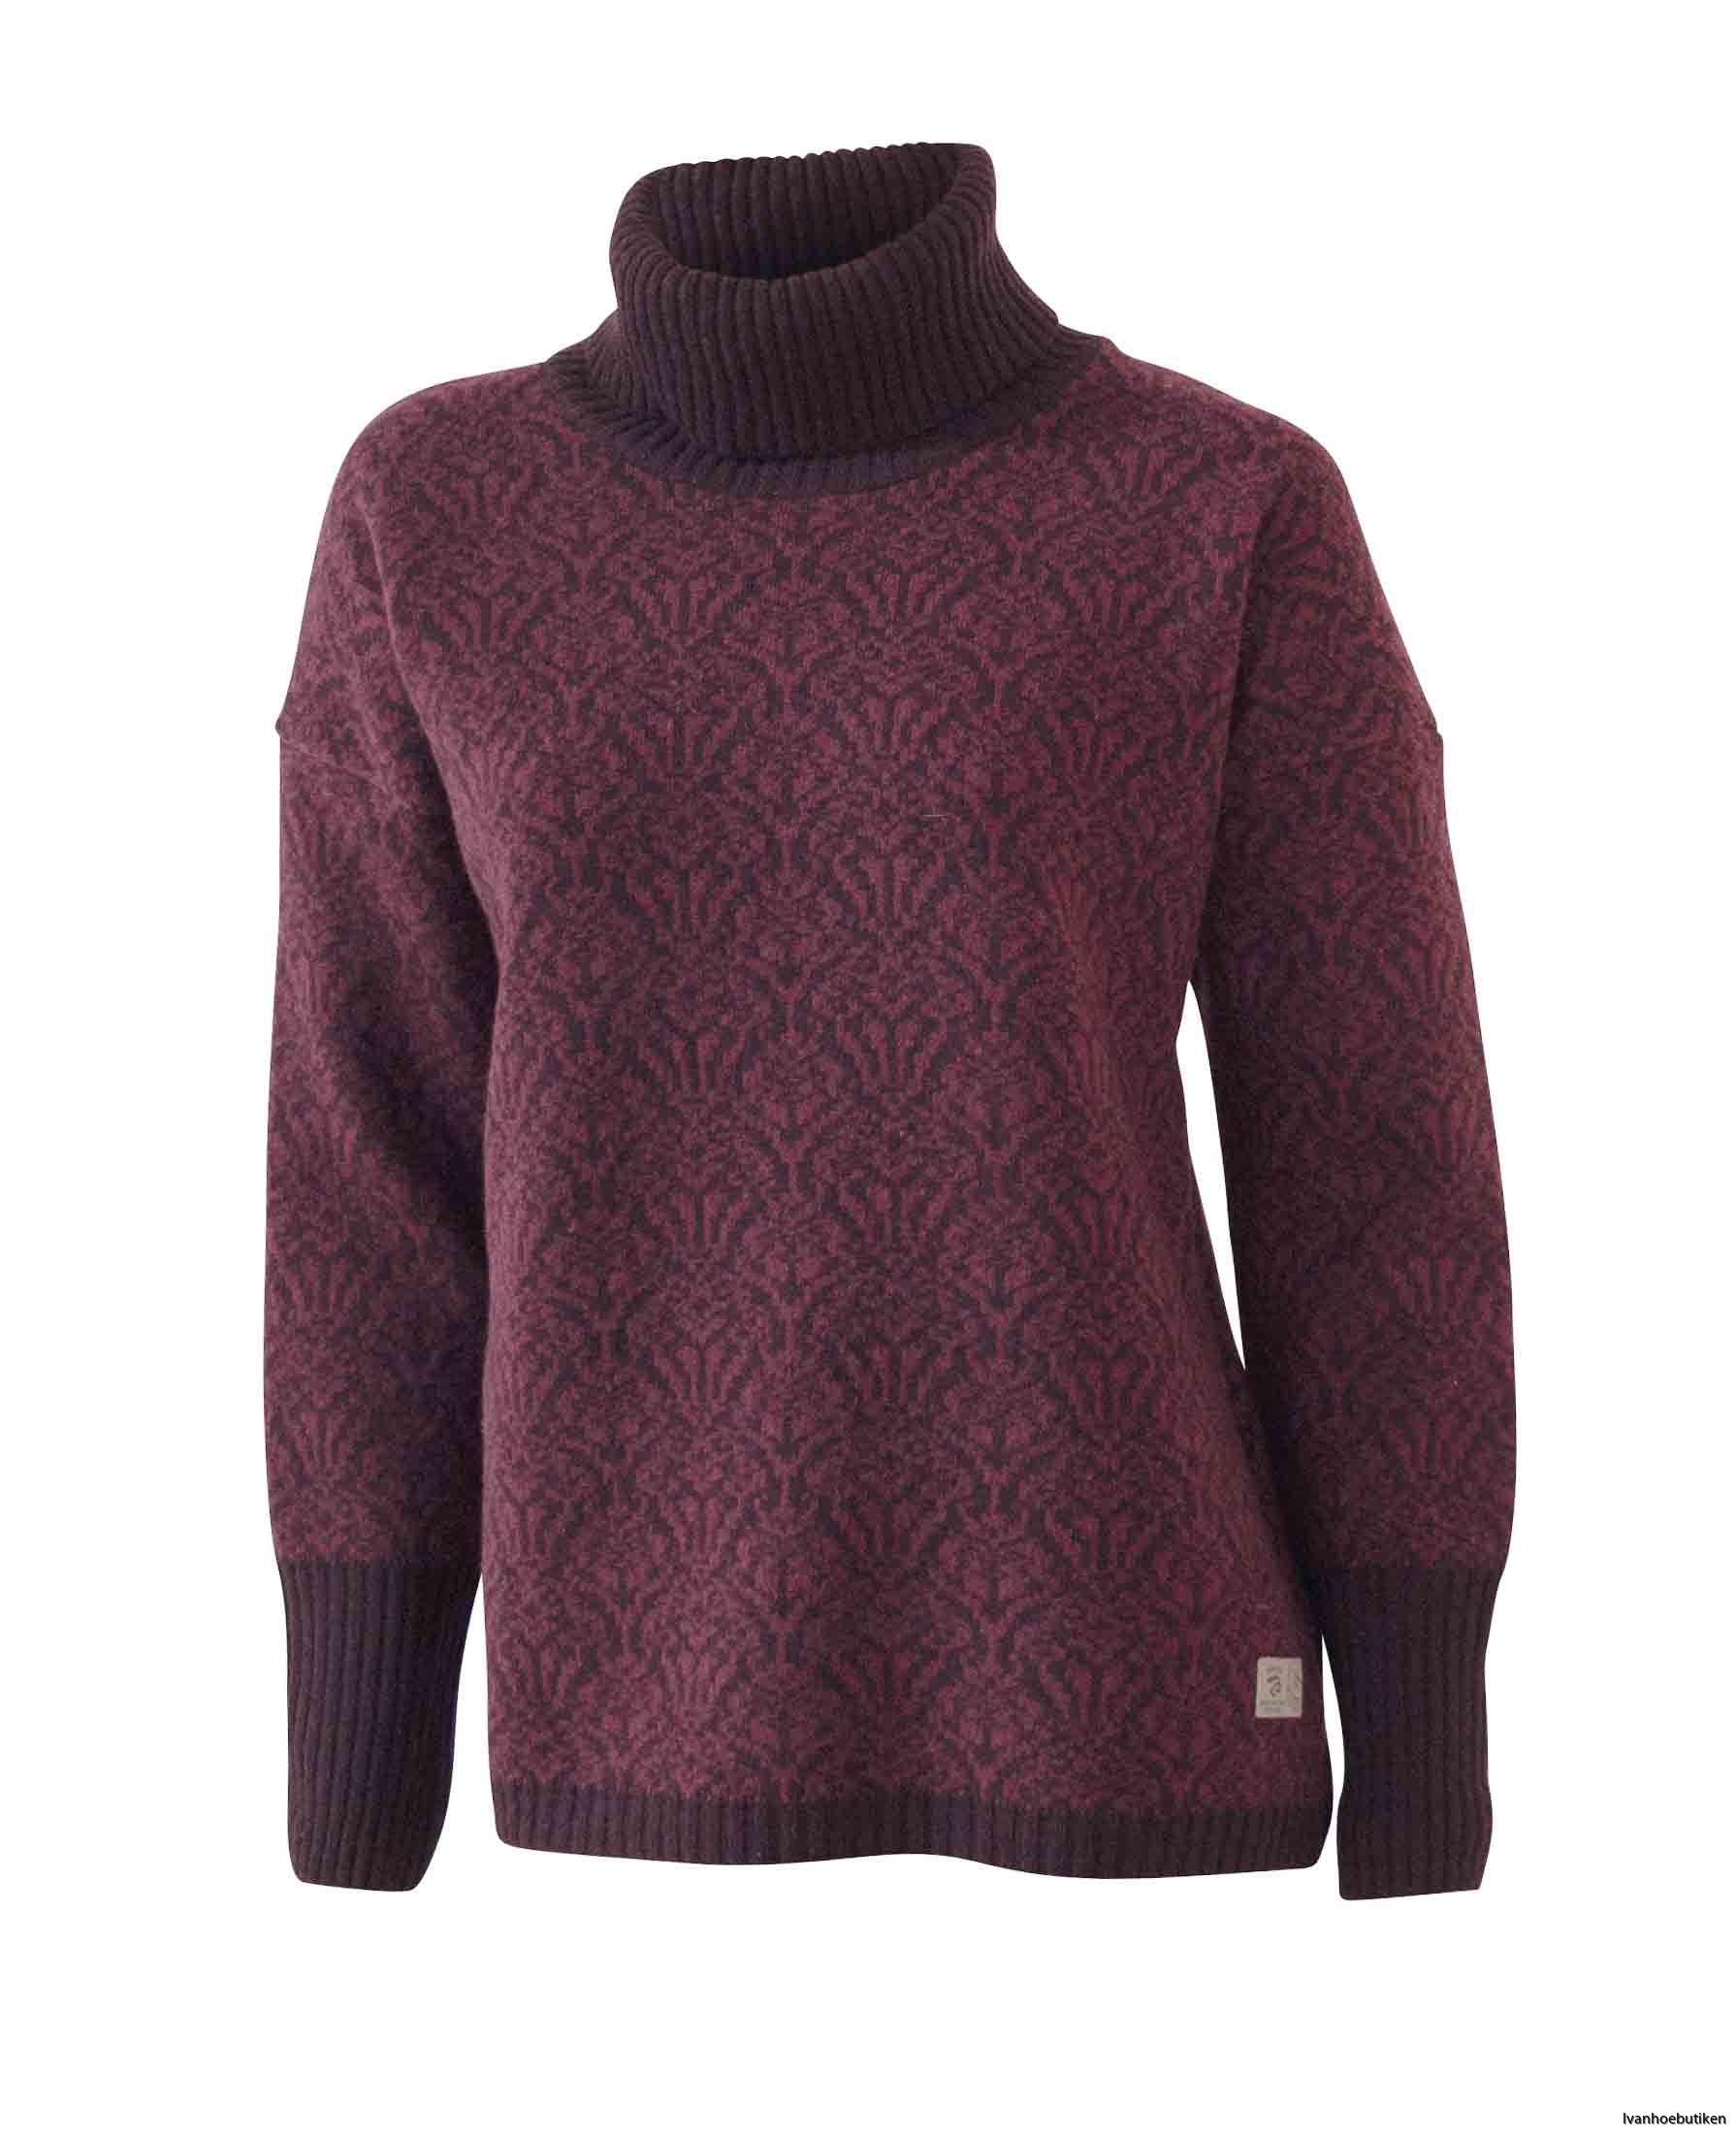 GY_Korrebo_Sweater_047